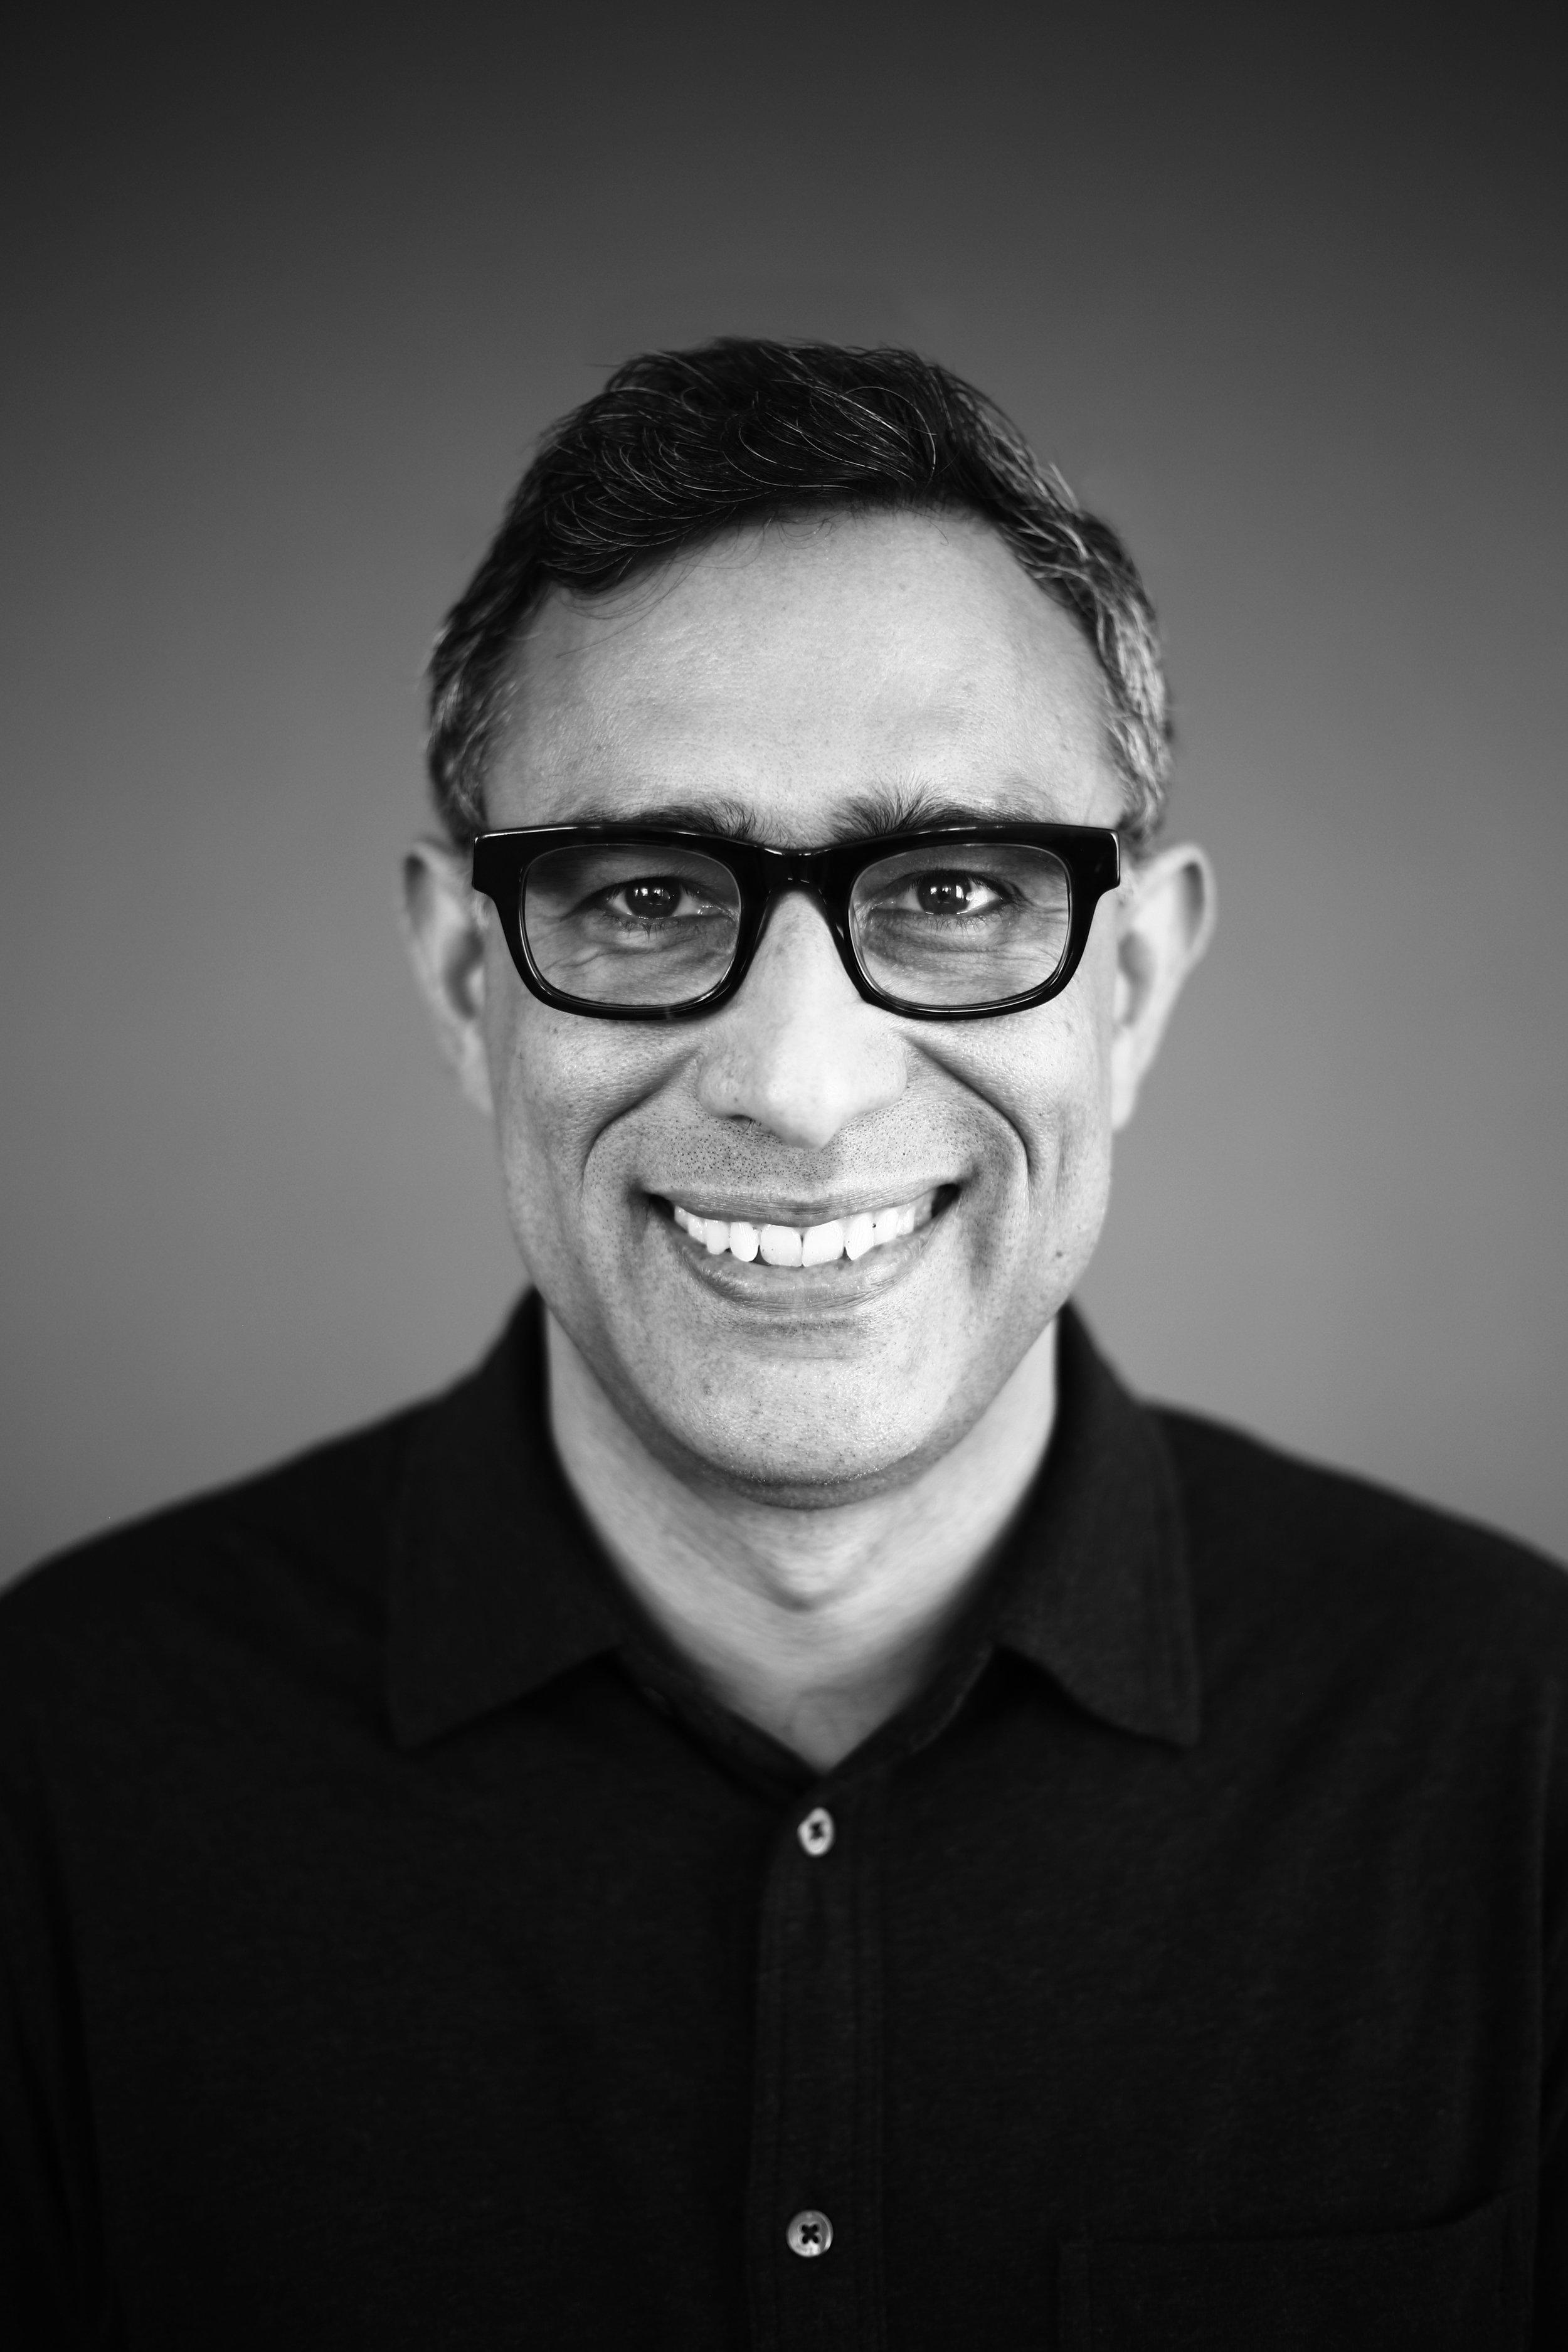 Tuhin Roy, SVP, New Digital Business & Innovation, Universal Music Group